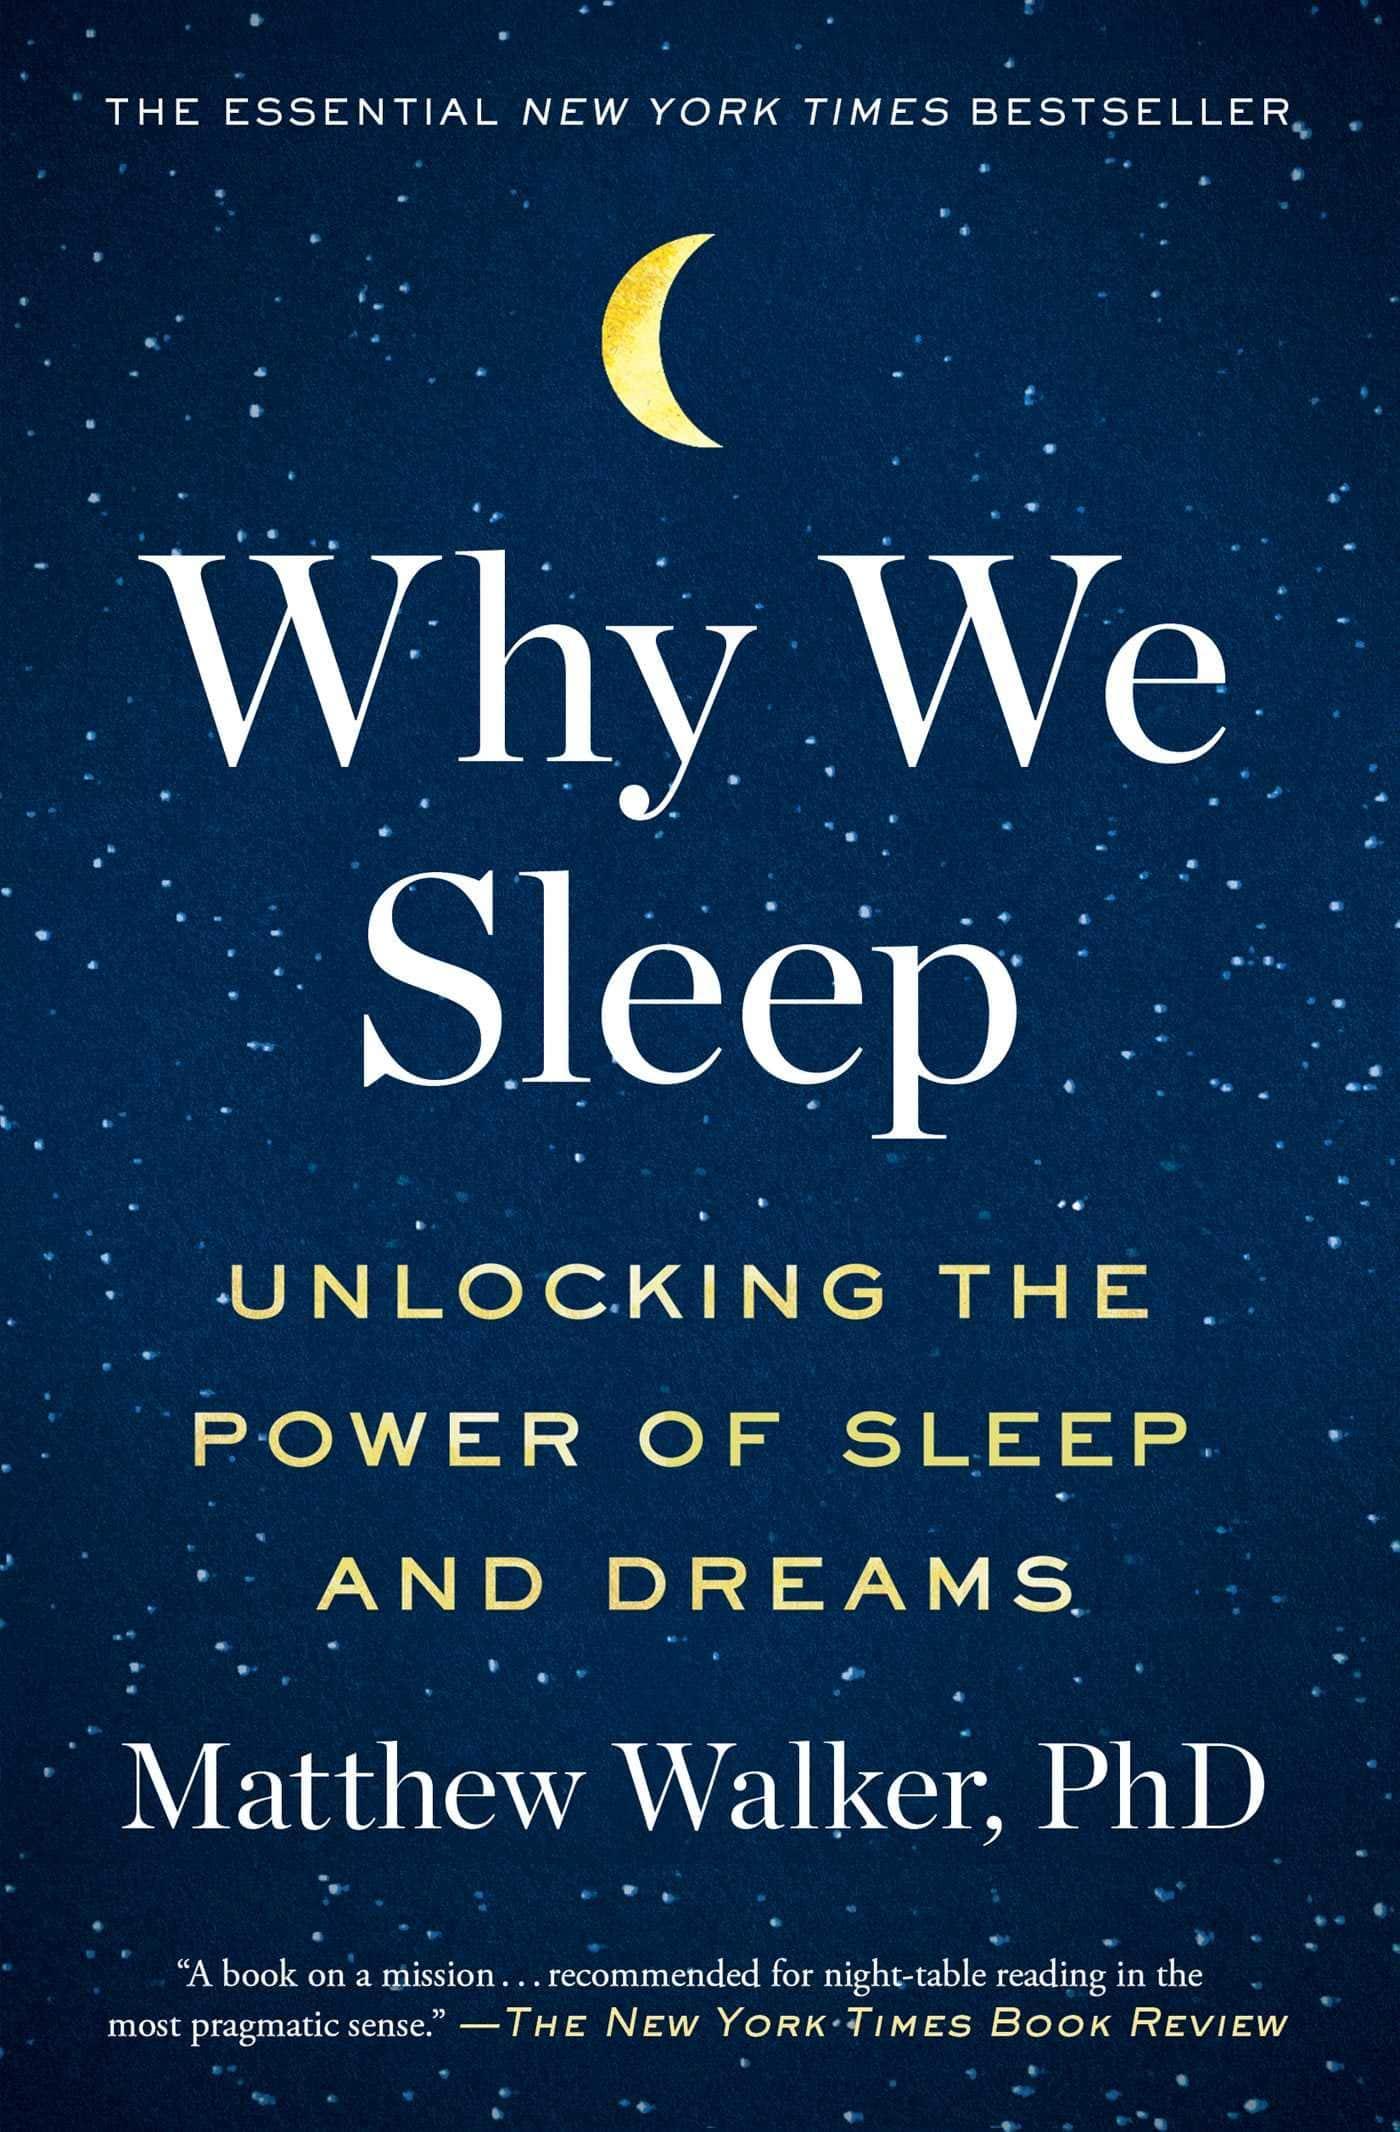 Why we sleep - Book cover